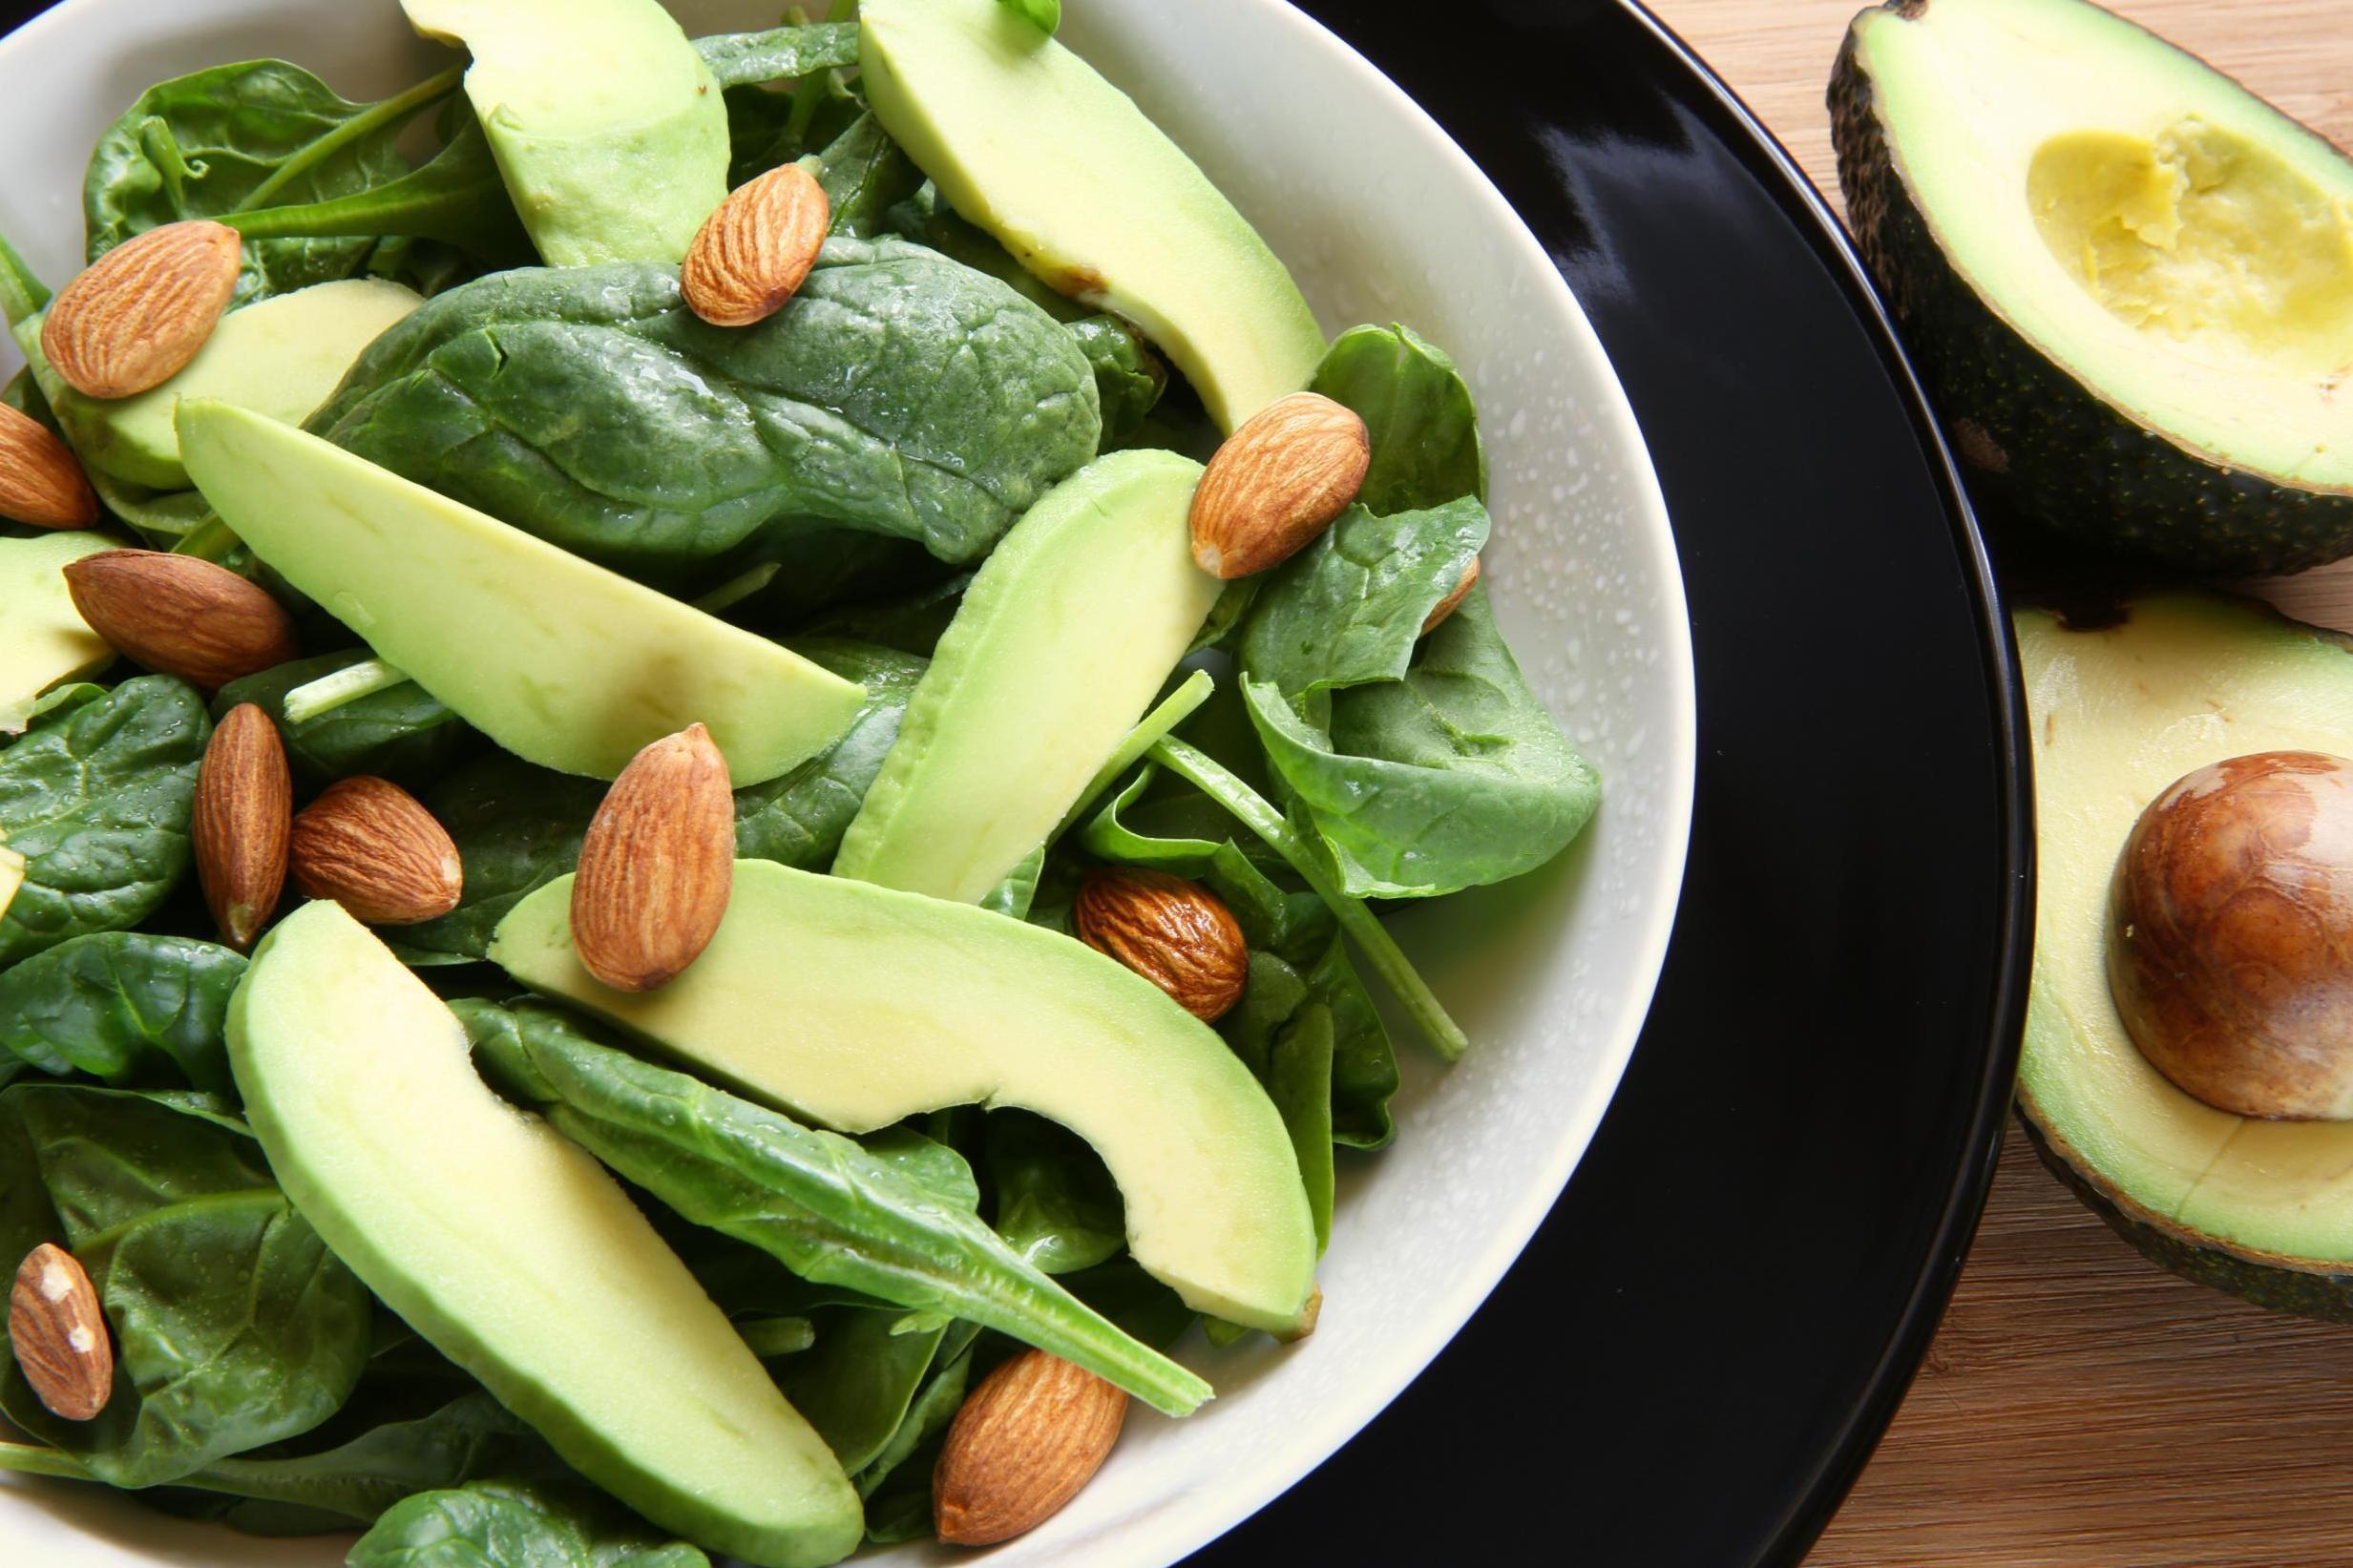 Psychiatrist reveals overlooked vitamin that boosts brain health